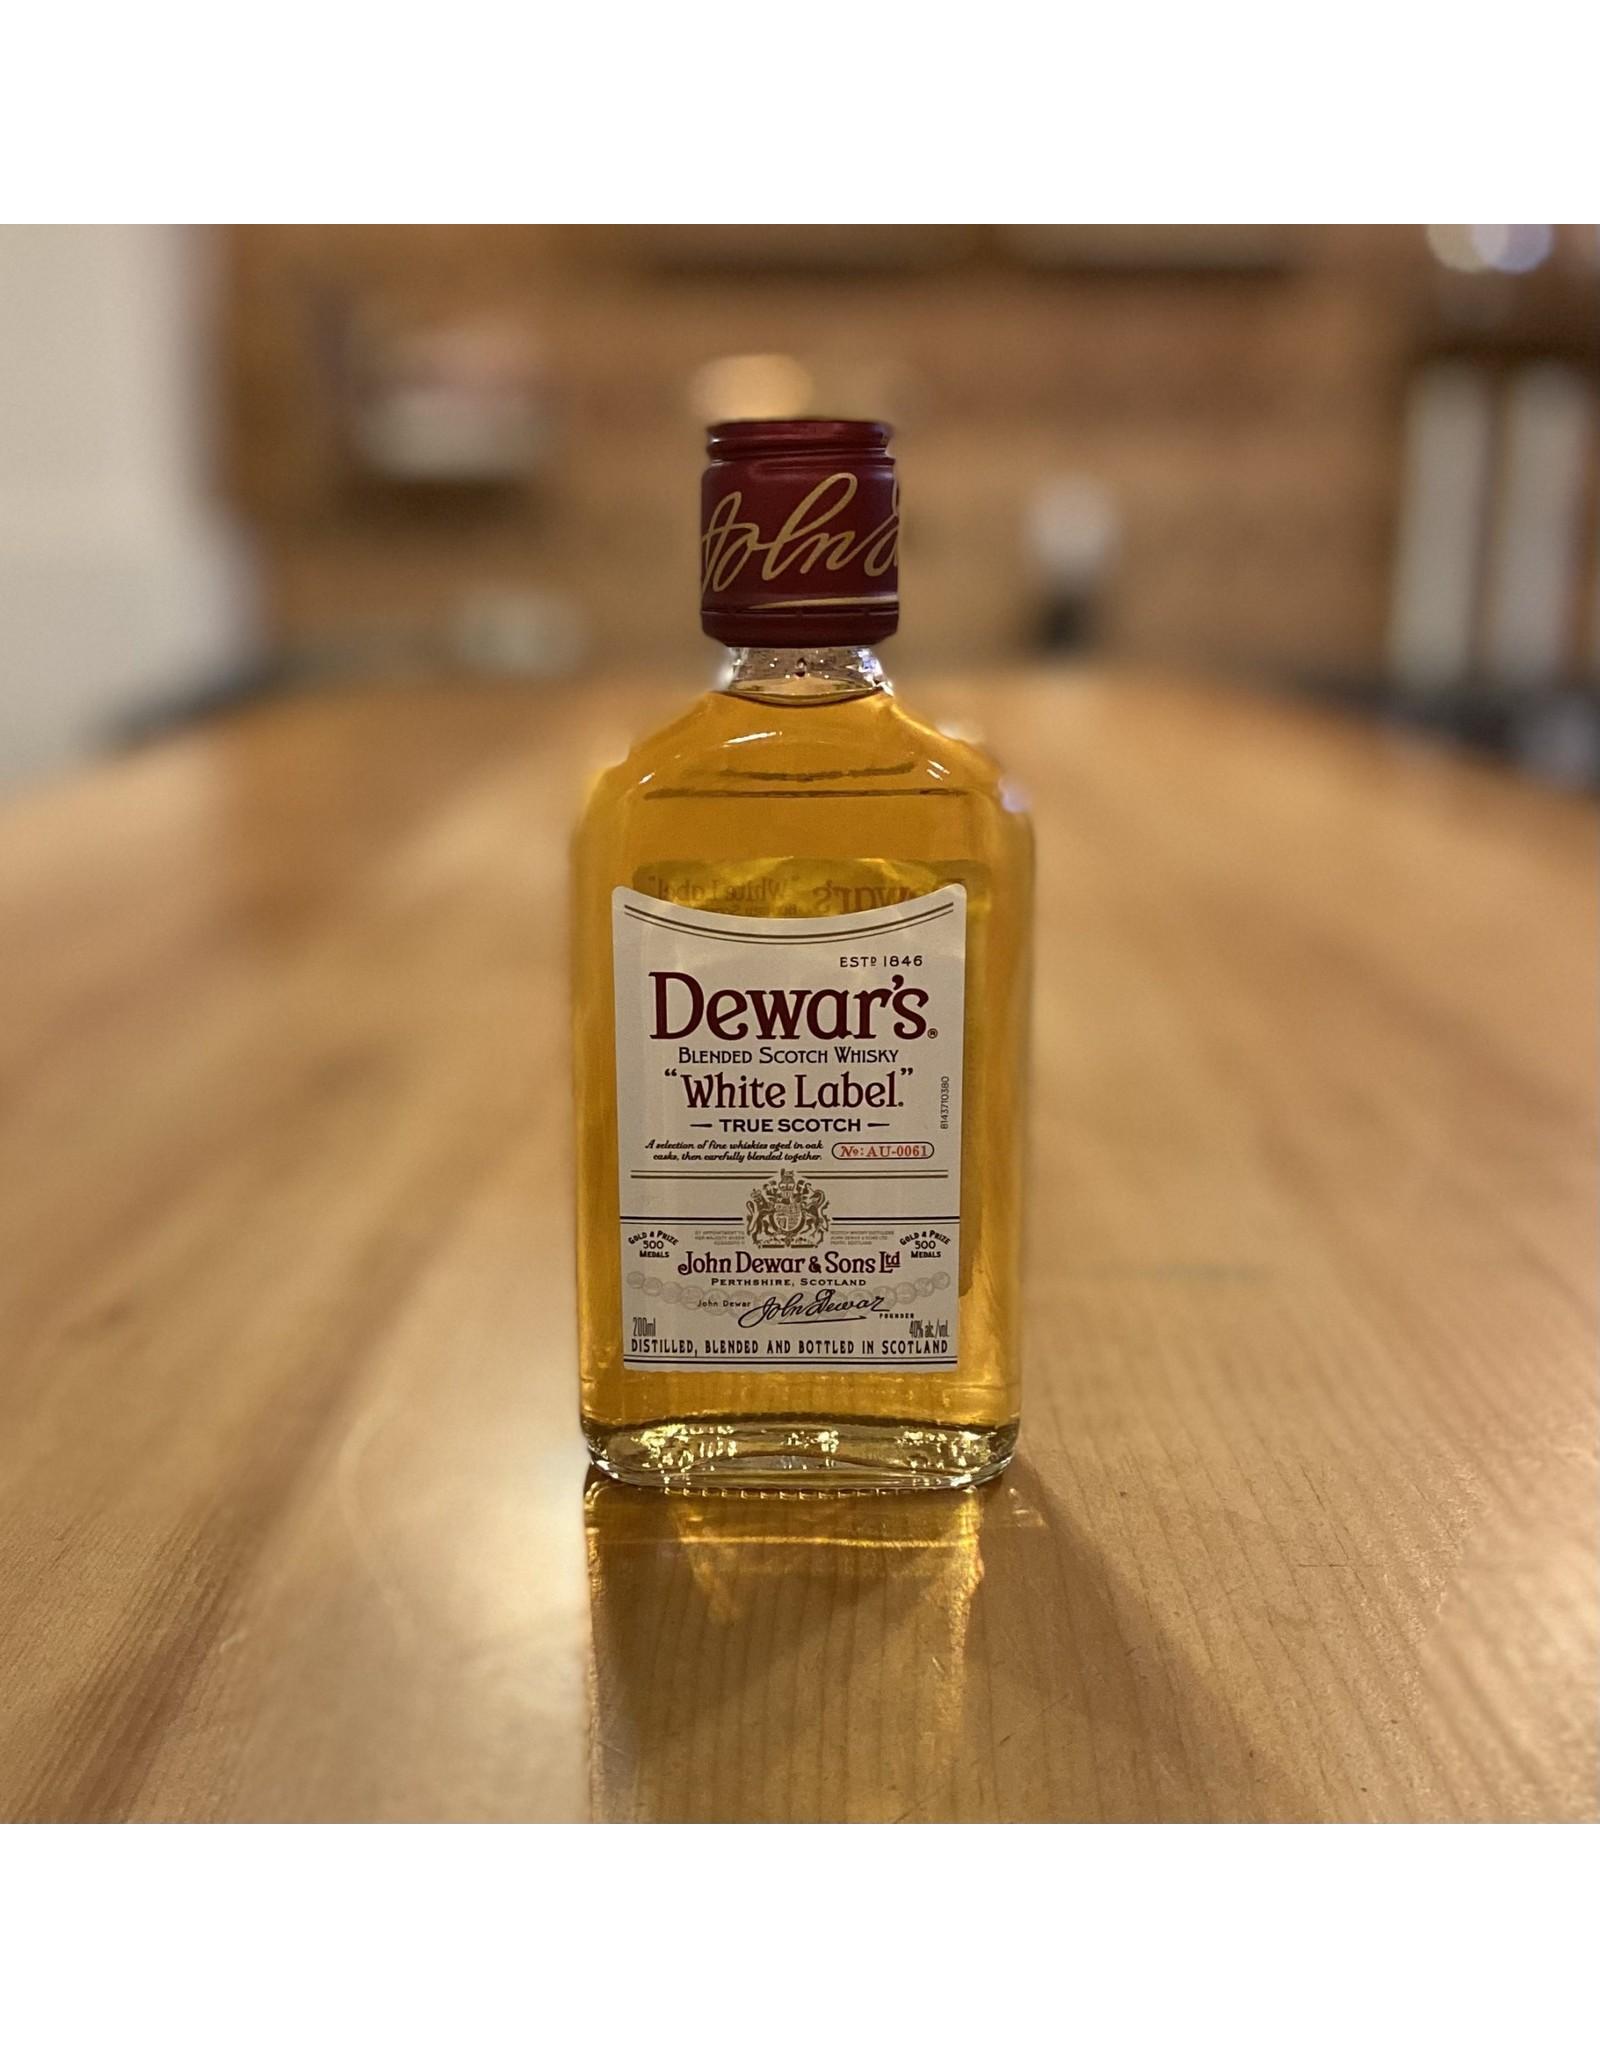 Dewar's White Label Blended Scotch Whisky 200ml - Scotland